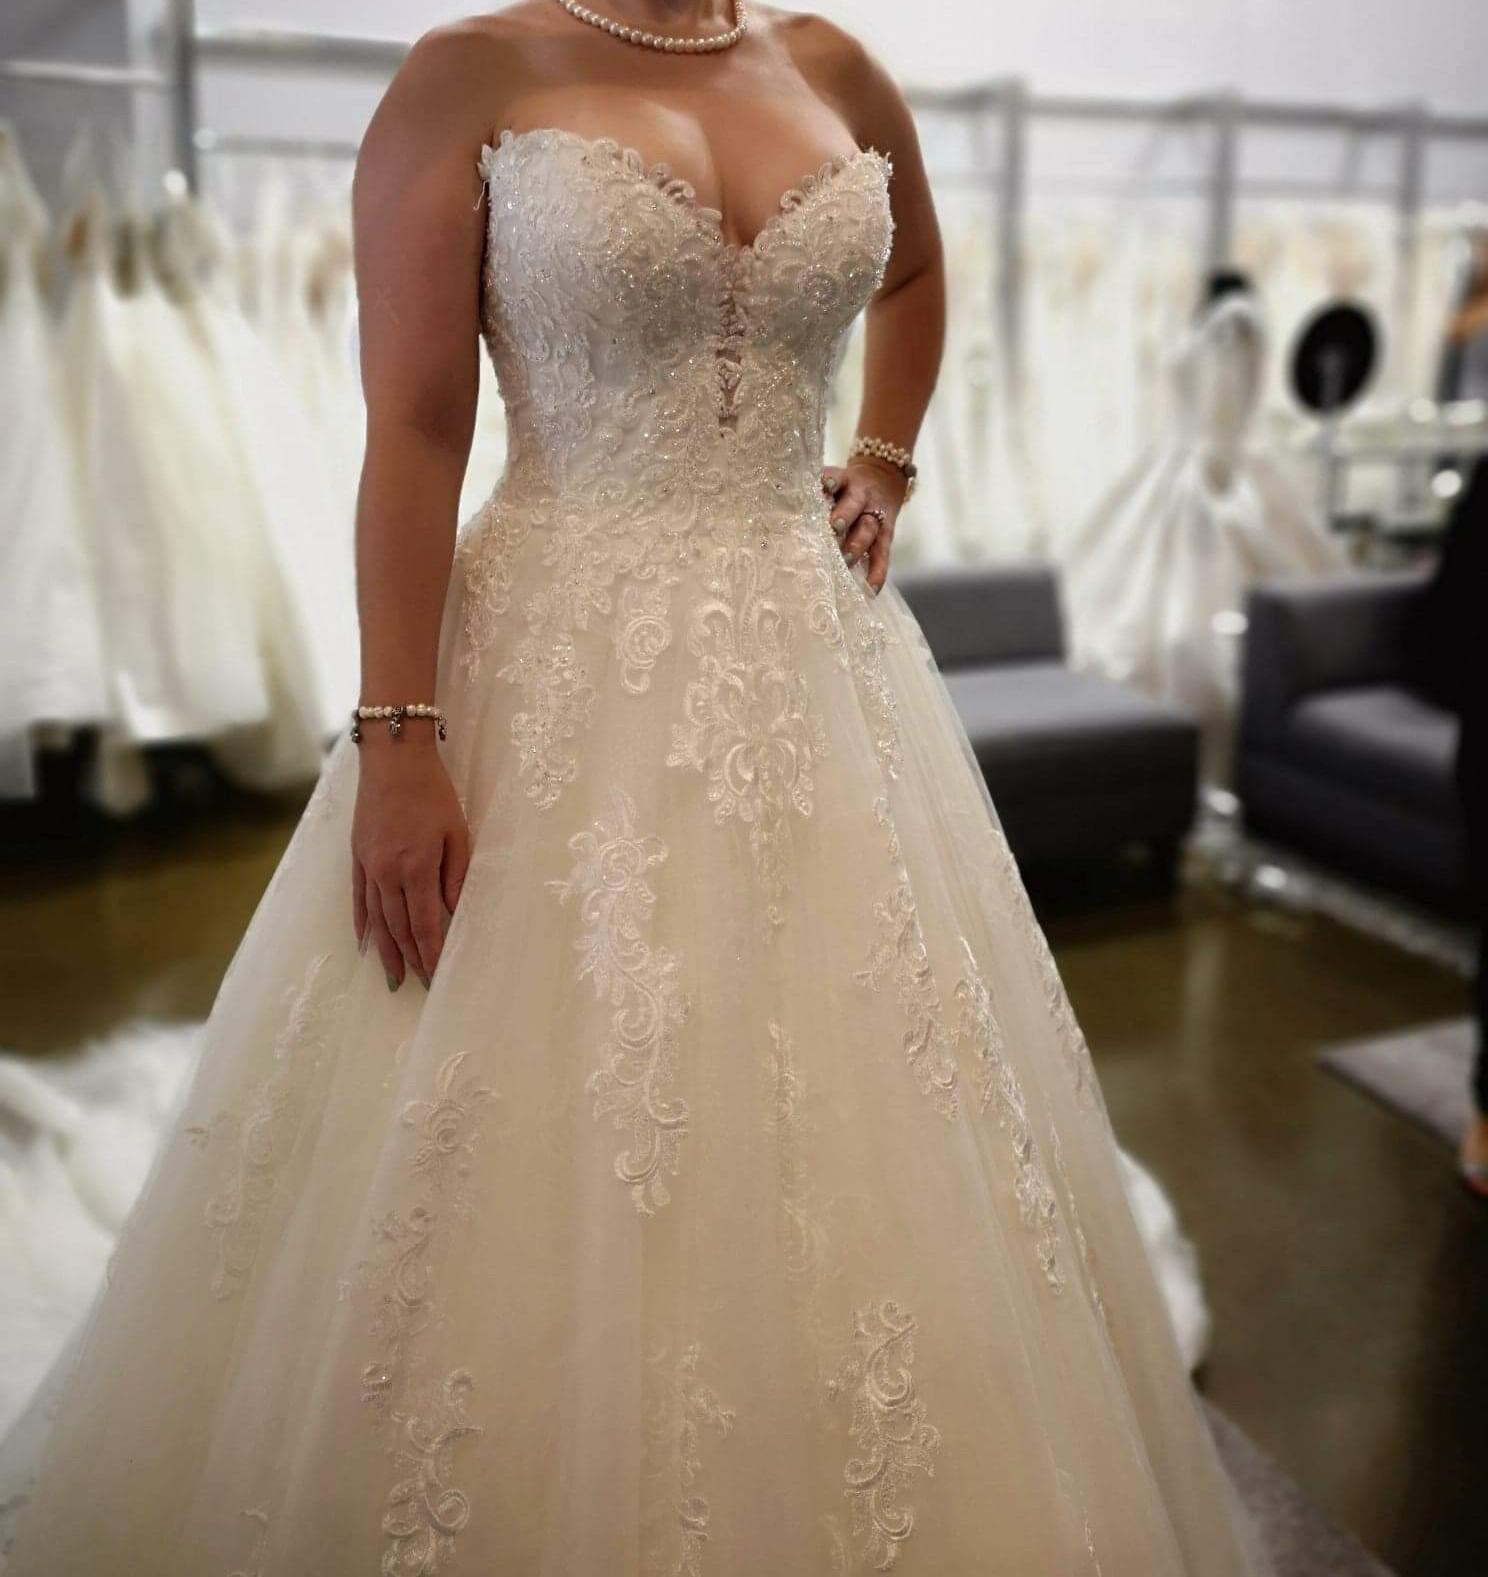 Maggie Sottero Glenn New Wedding Dress On Sale 35% Off